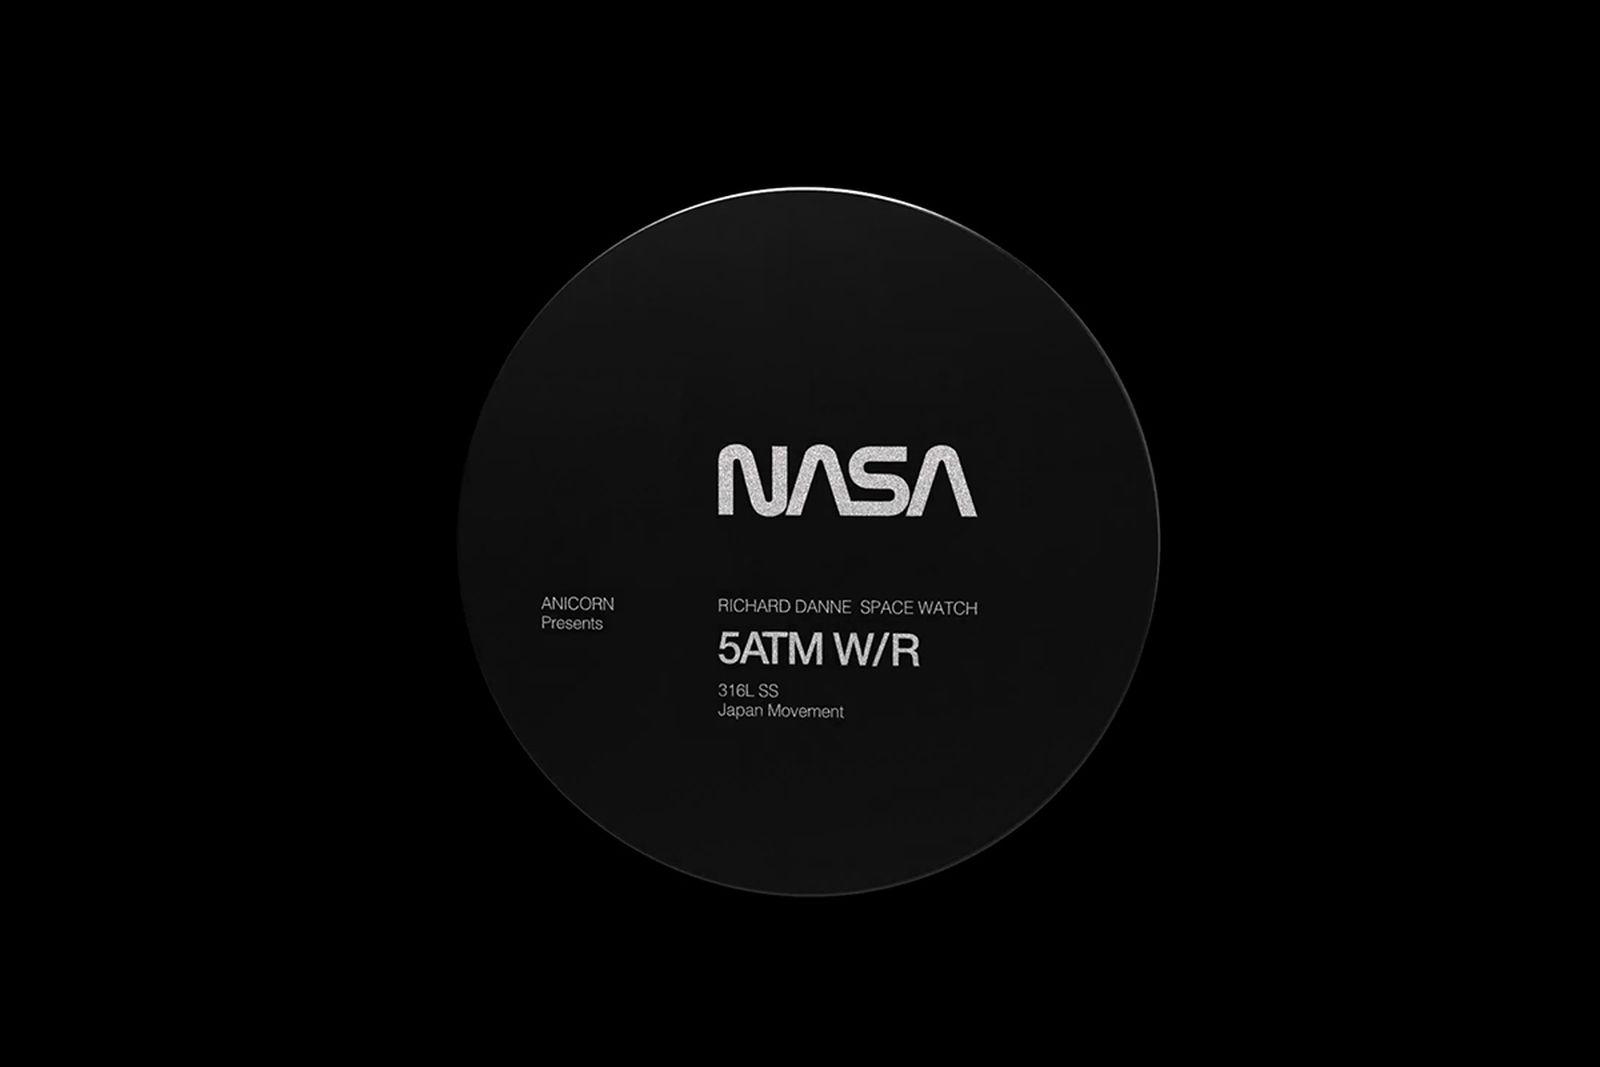 nasa space watch